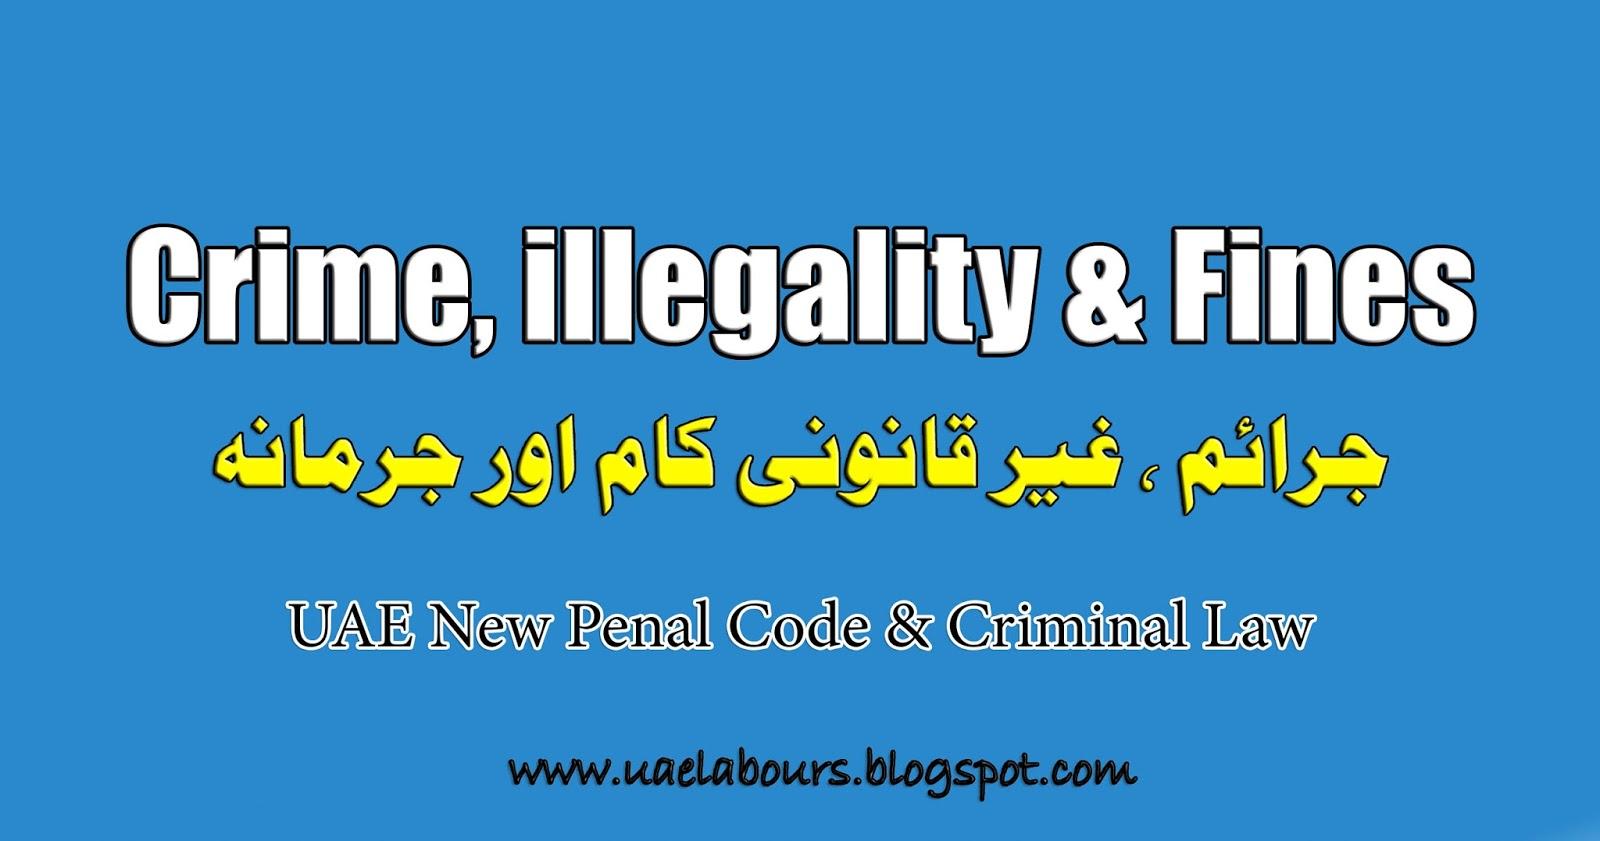 Uae Criminal Law And Uae Penal Code - Uae Labours-6770